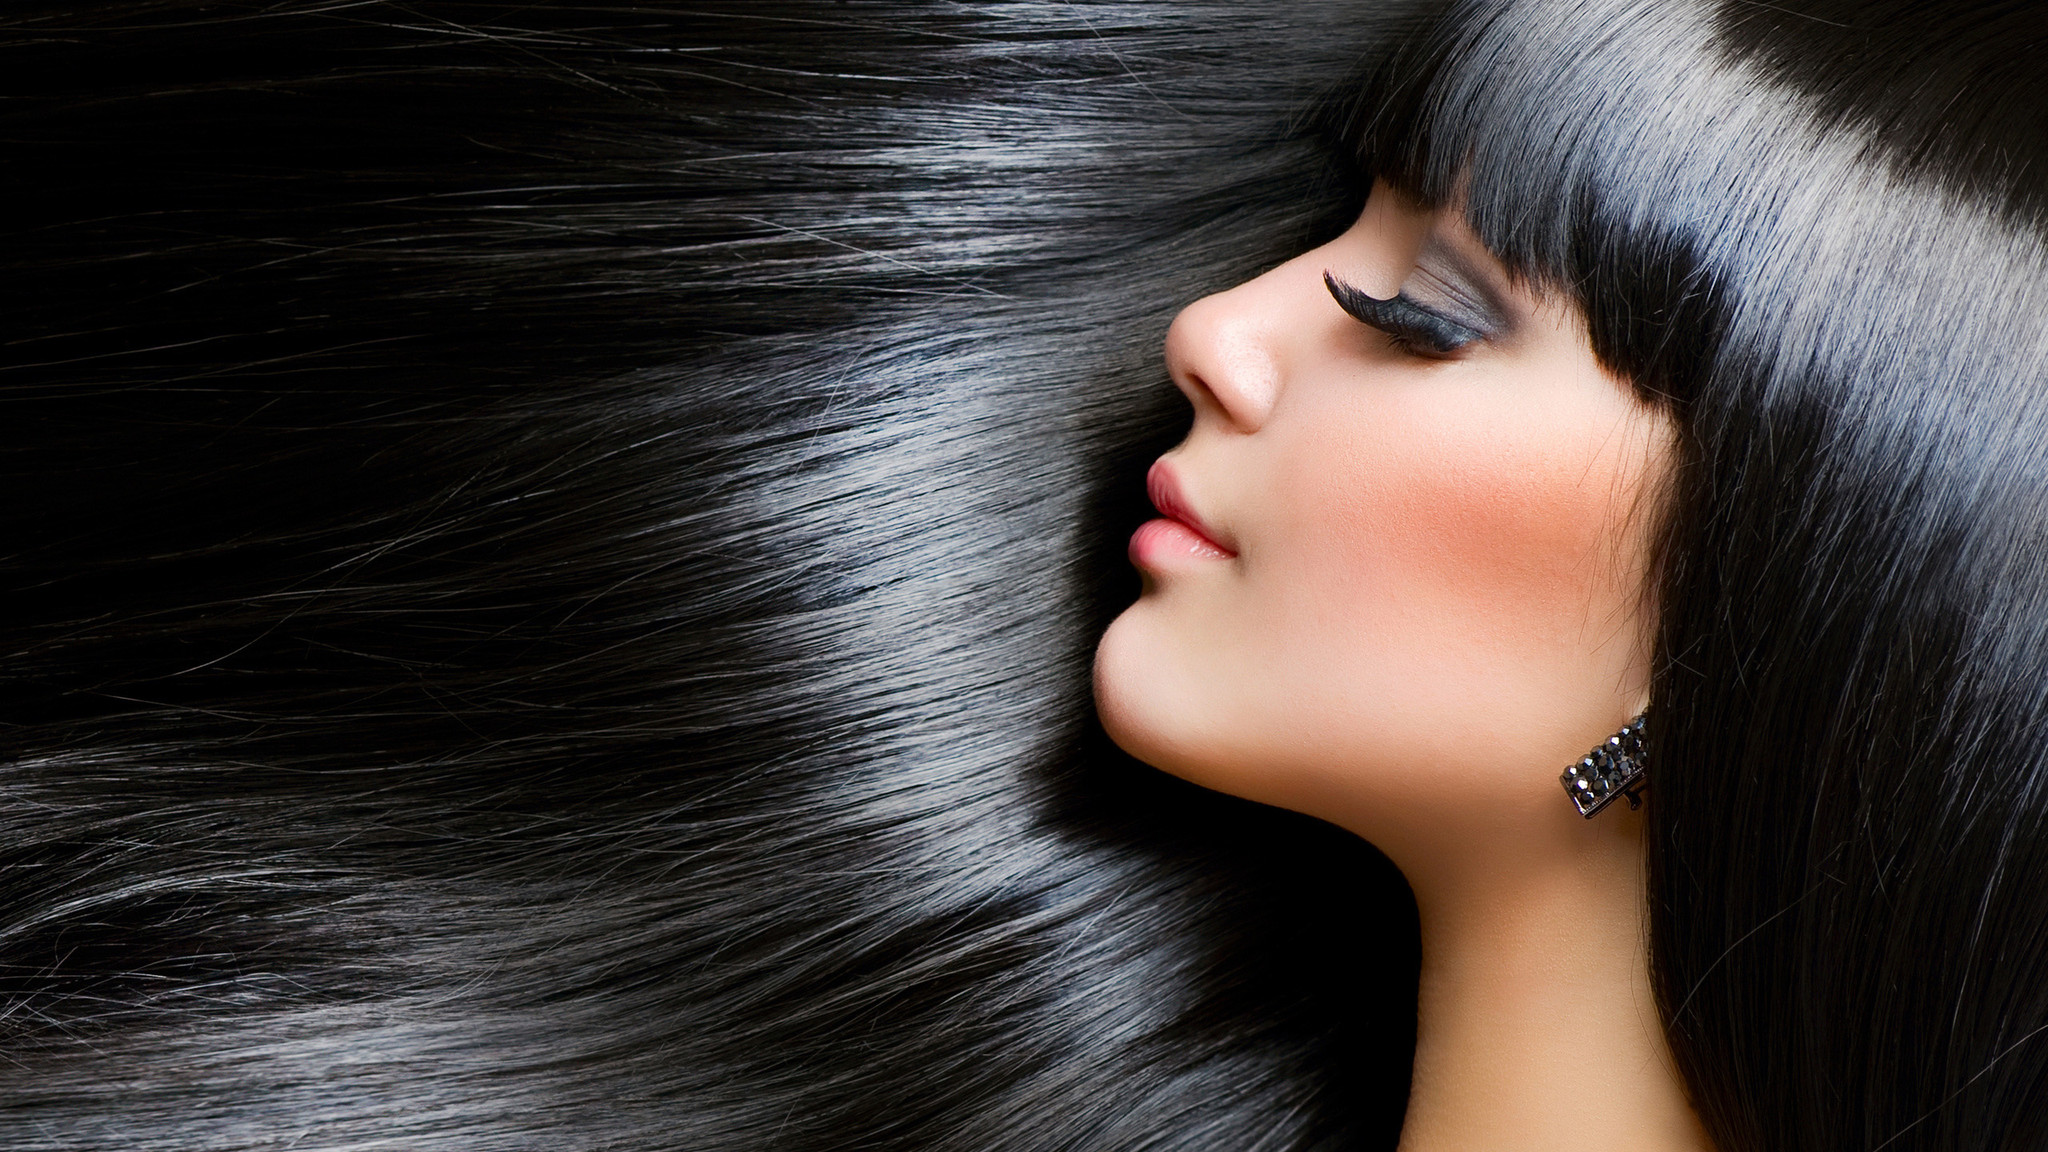 Mau Rambut Lurus Alami Bak Iklan Shampo  Tak Perlu Smoothing ke Salon 59678f2d06